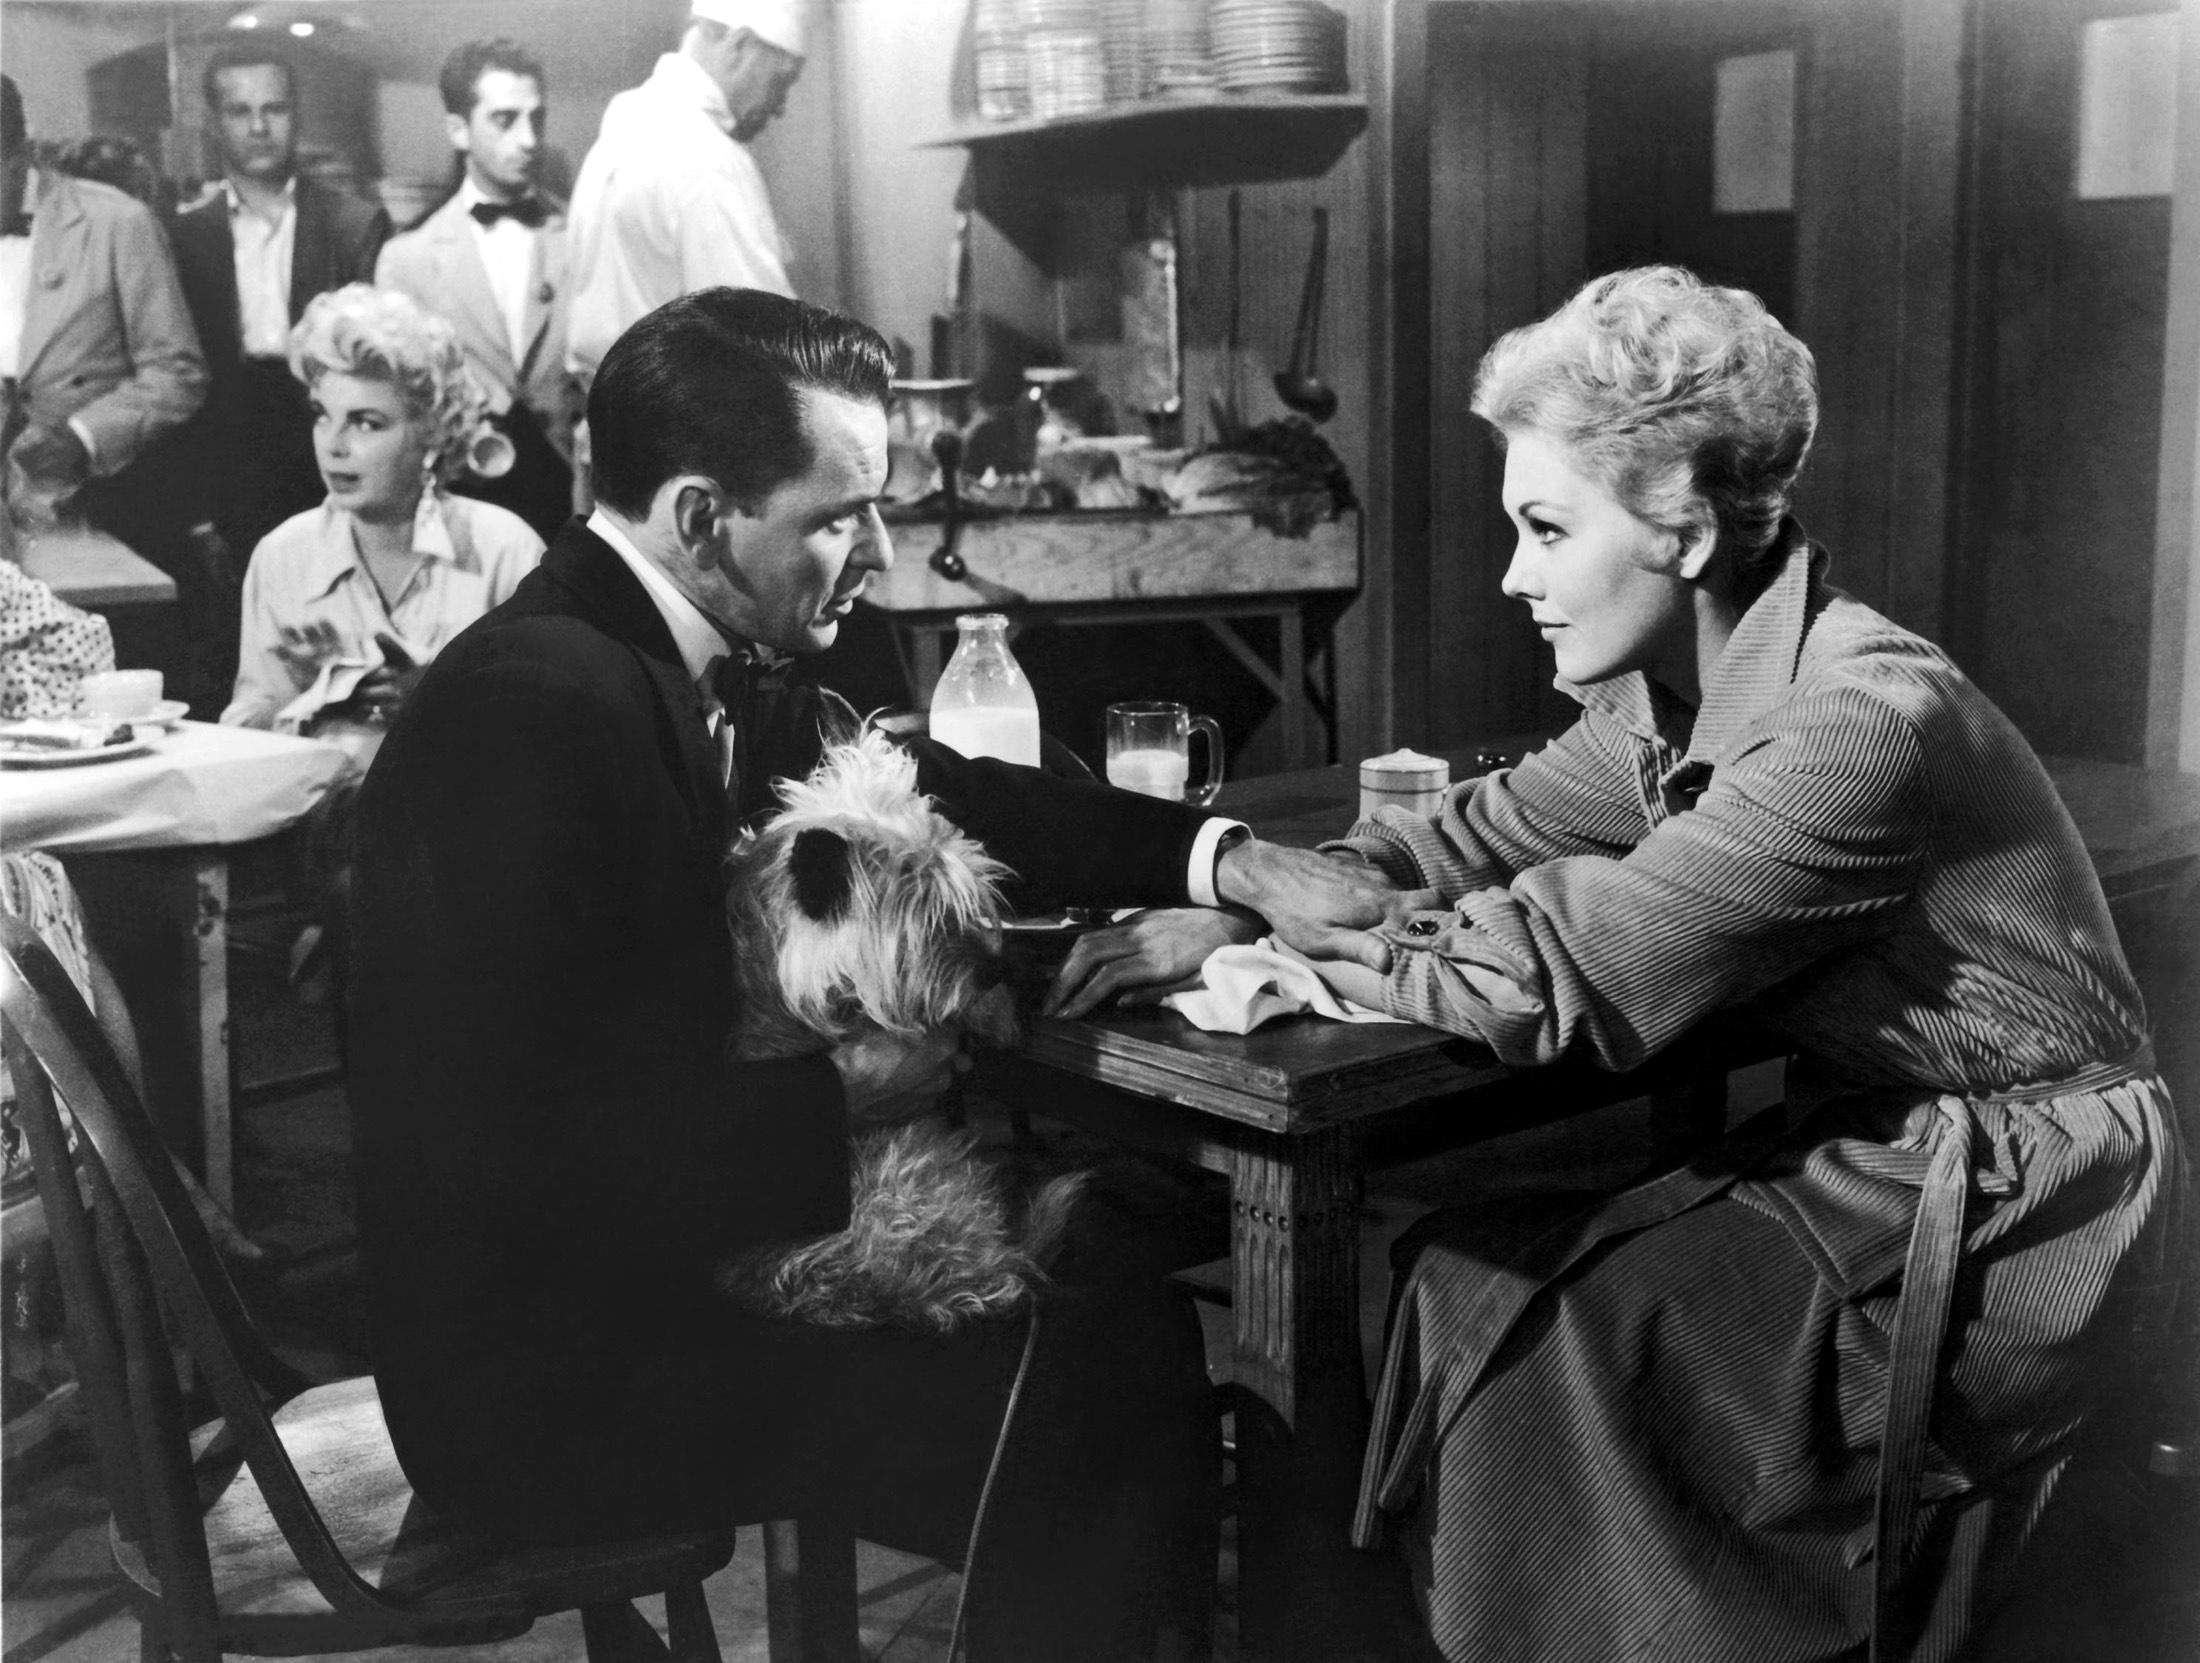 Frank Sinatra With Kim Novak and Barbara Nichols in background